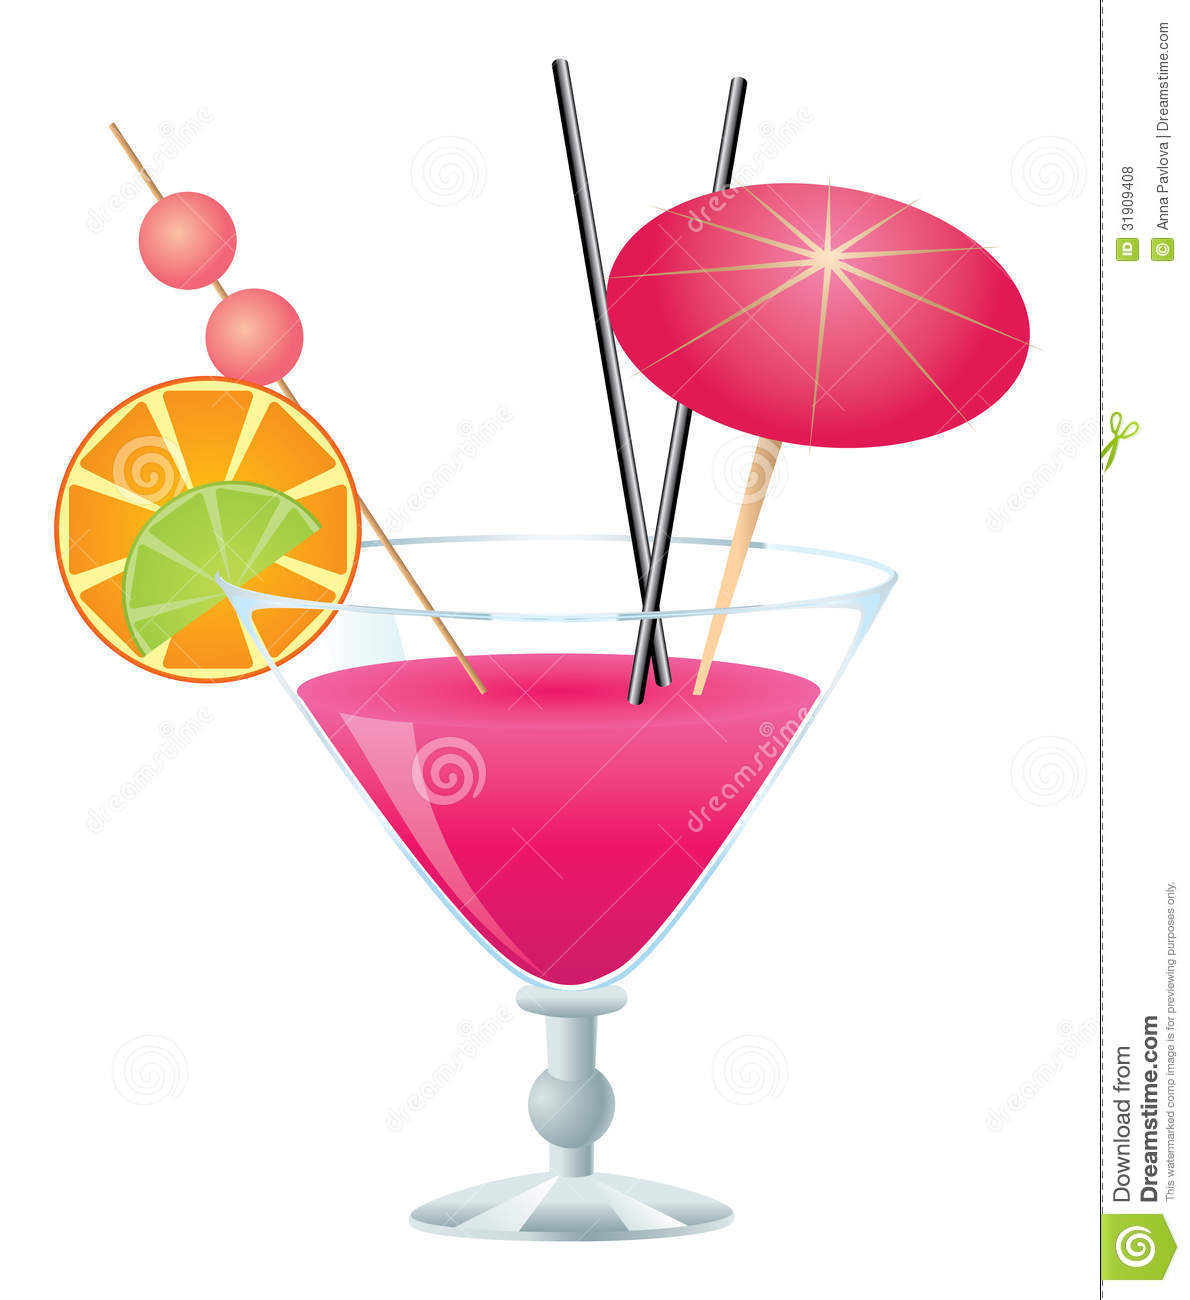 Cocktails cliparts kostenlos png download Cocktails Clip Art Free | Clipart Panda - Free Clipart Images png download